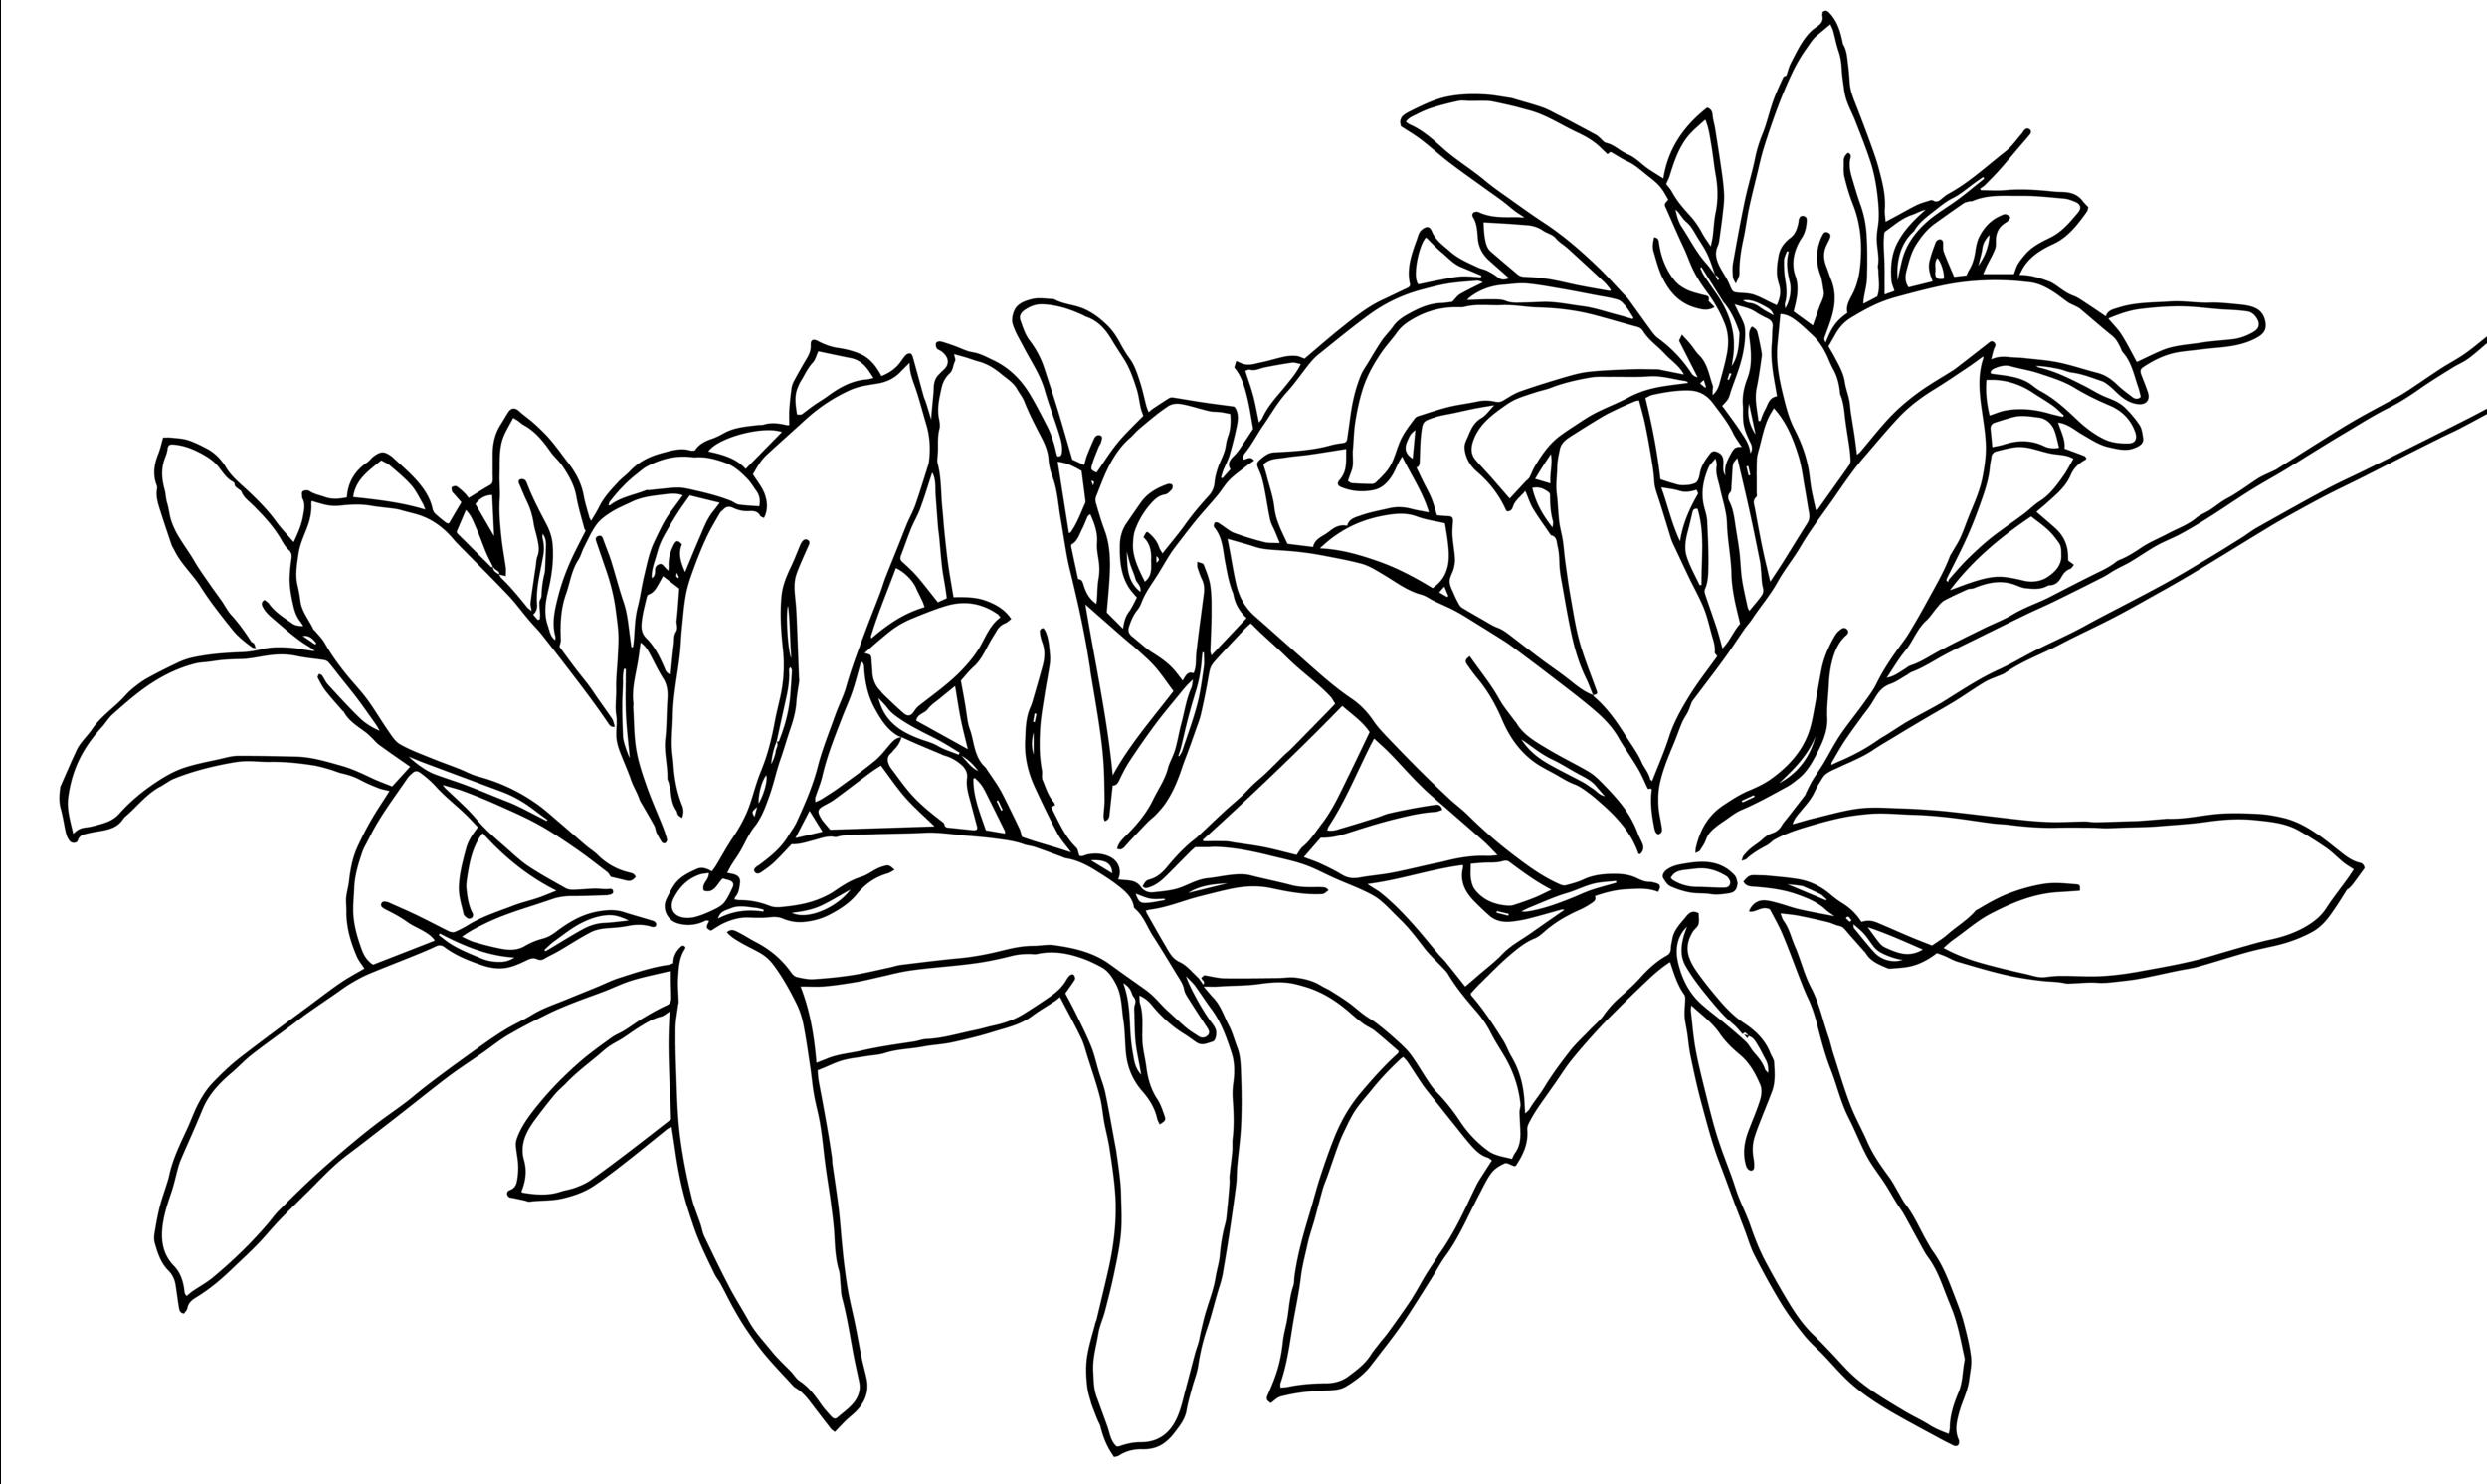 One of the original drawings of Kona Snow or Kona coffee blossoms, used in making the coffee print of the new Kona Coffee & Tea bags. ART: Dayva Keolanui